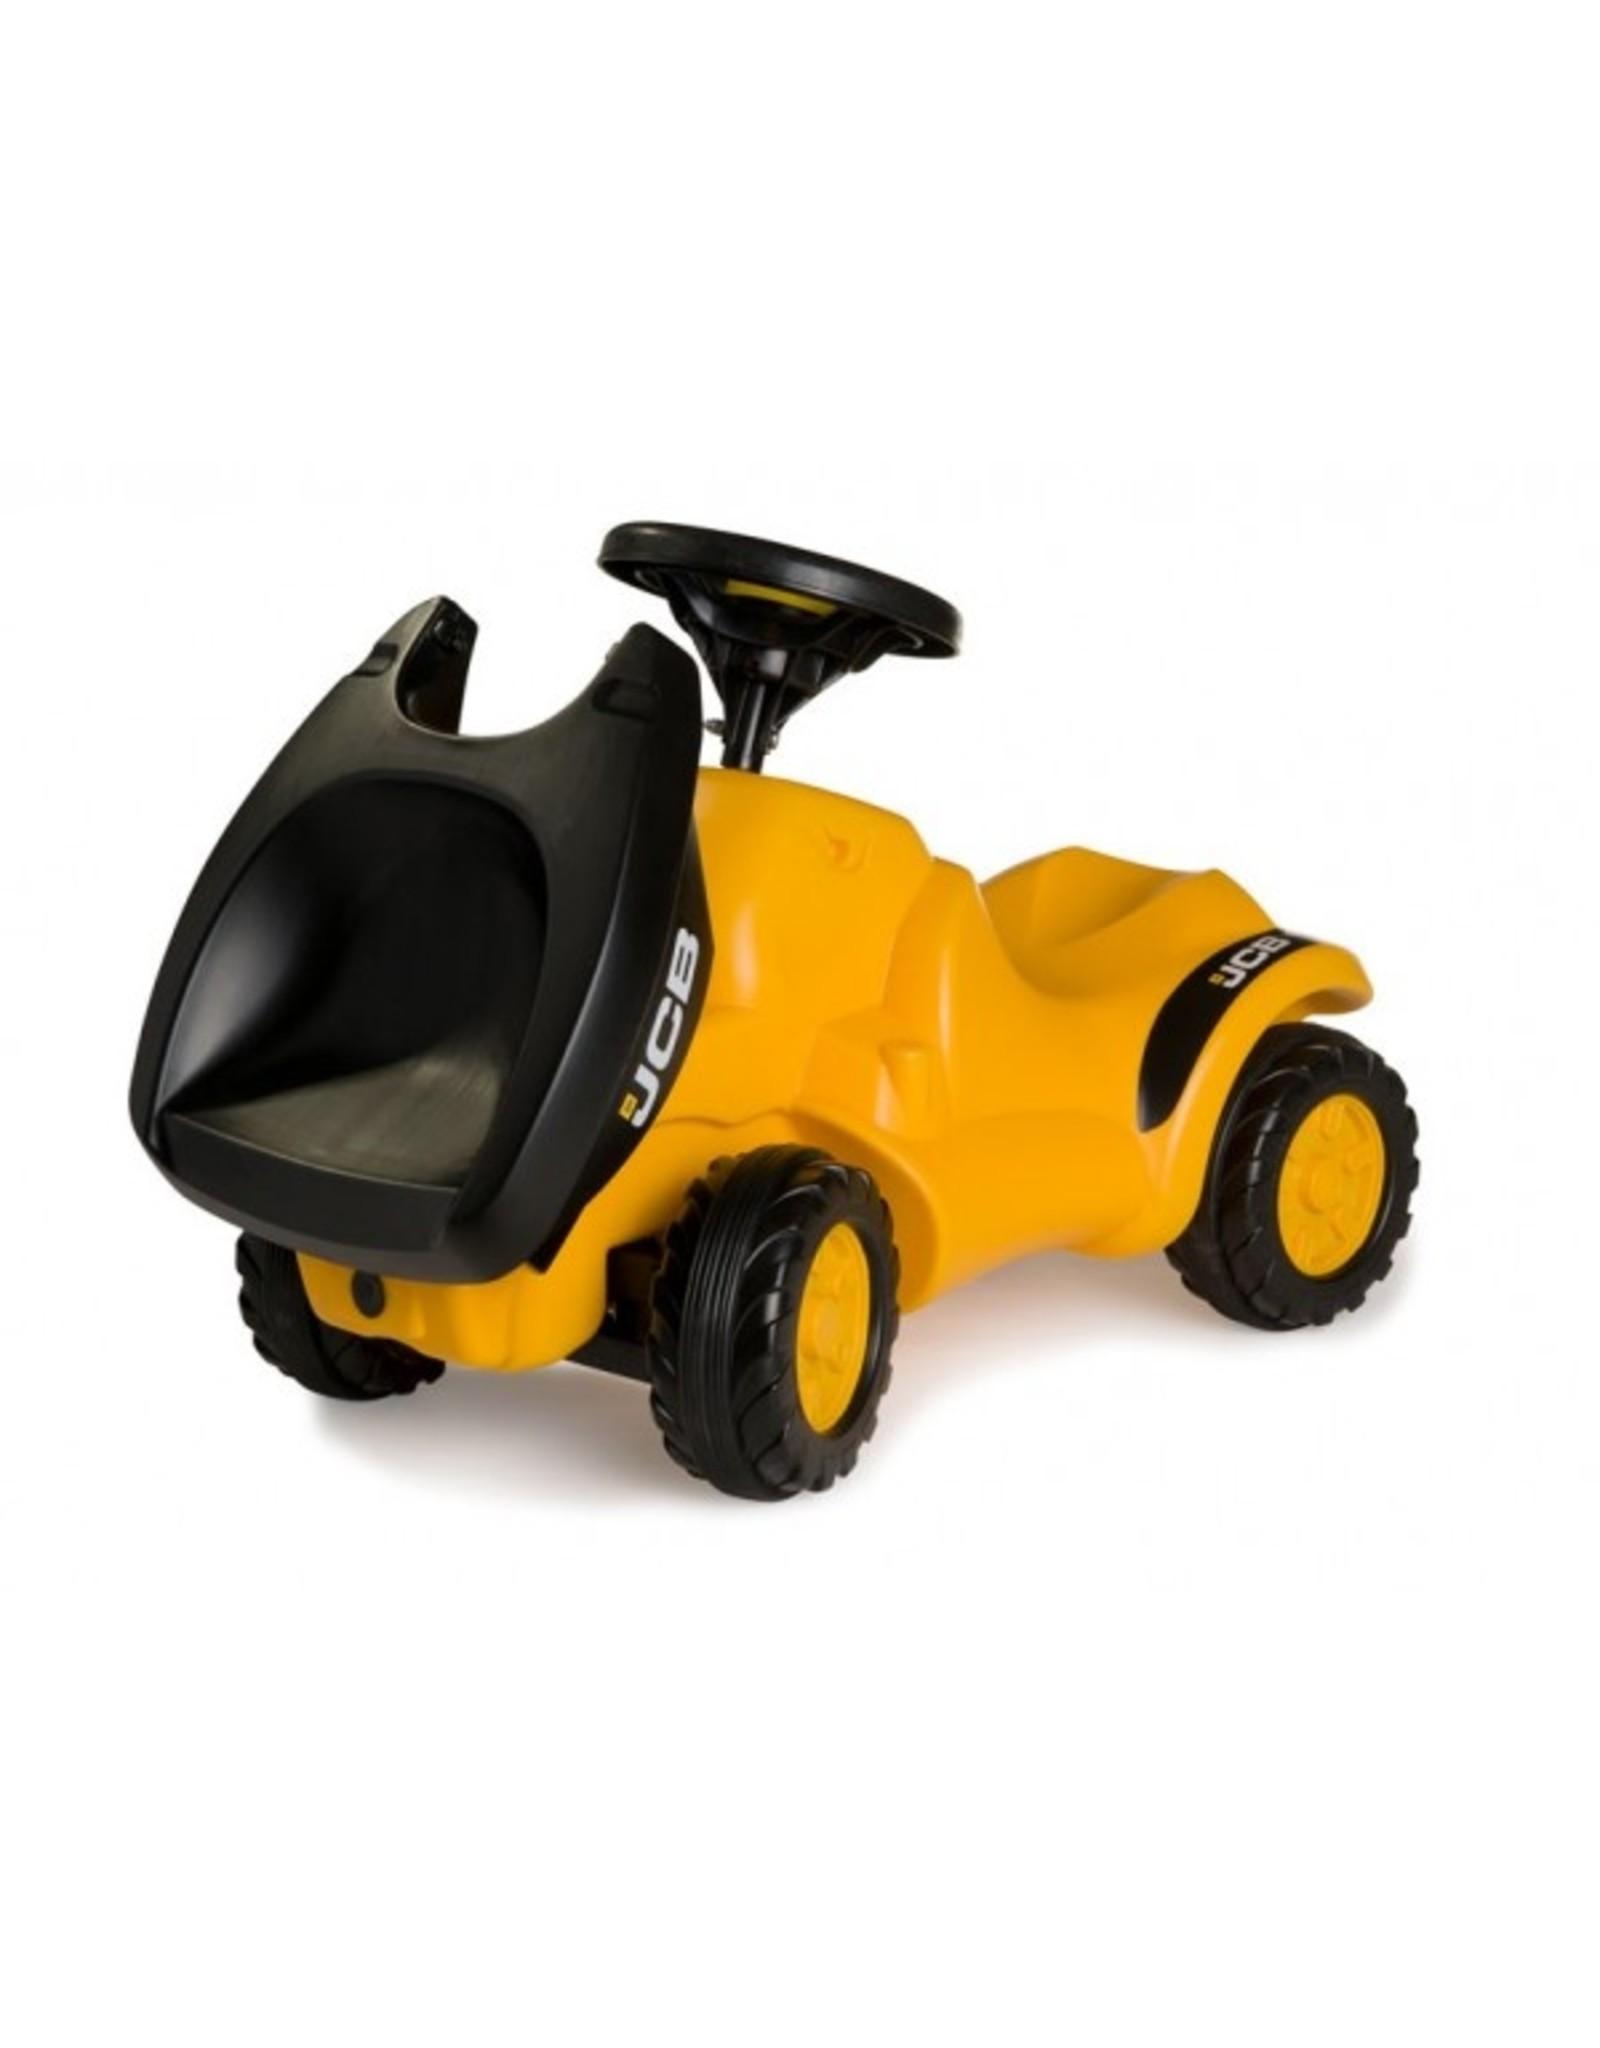 Rolly Toys Rolly toys rollyMinitrac Dumper JCB 135646